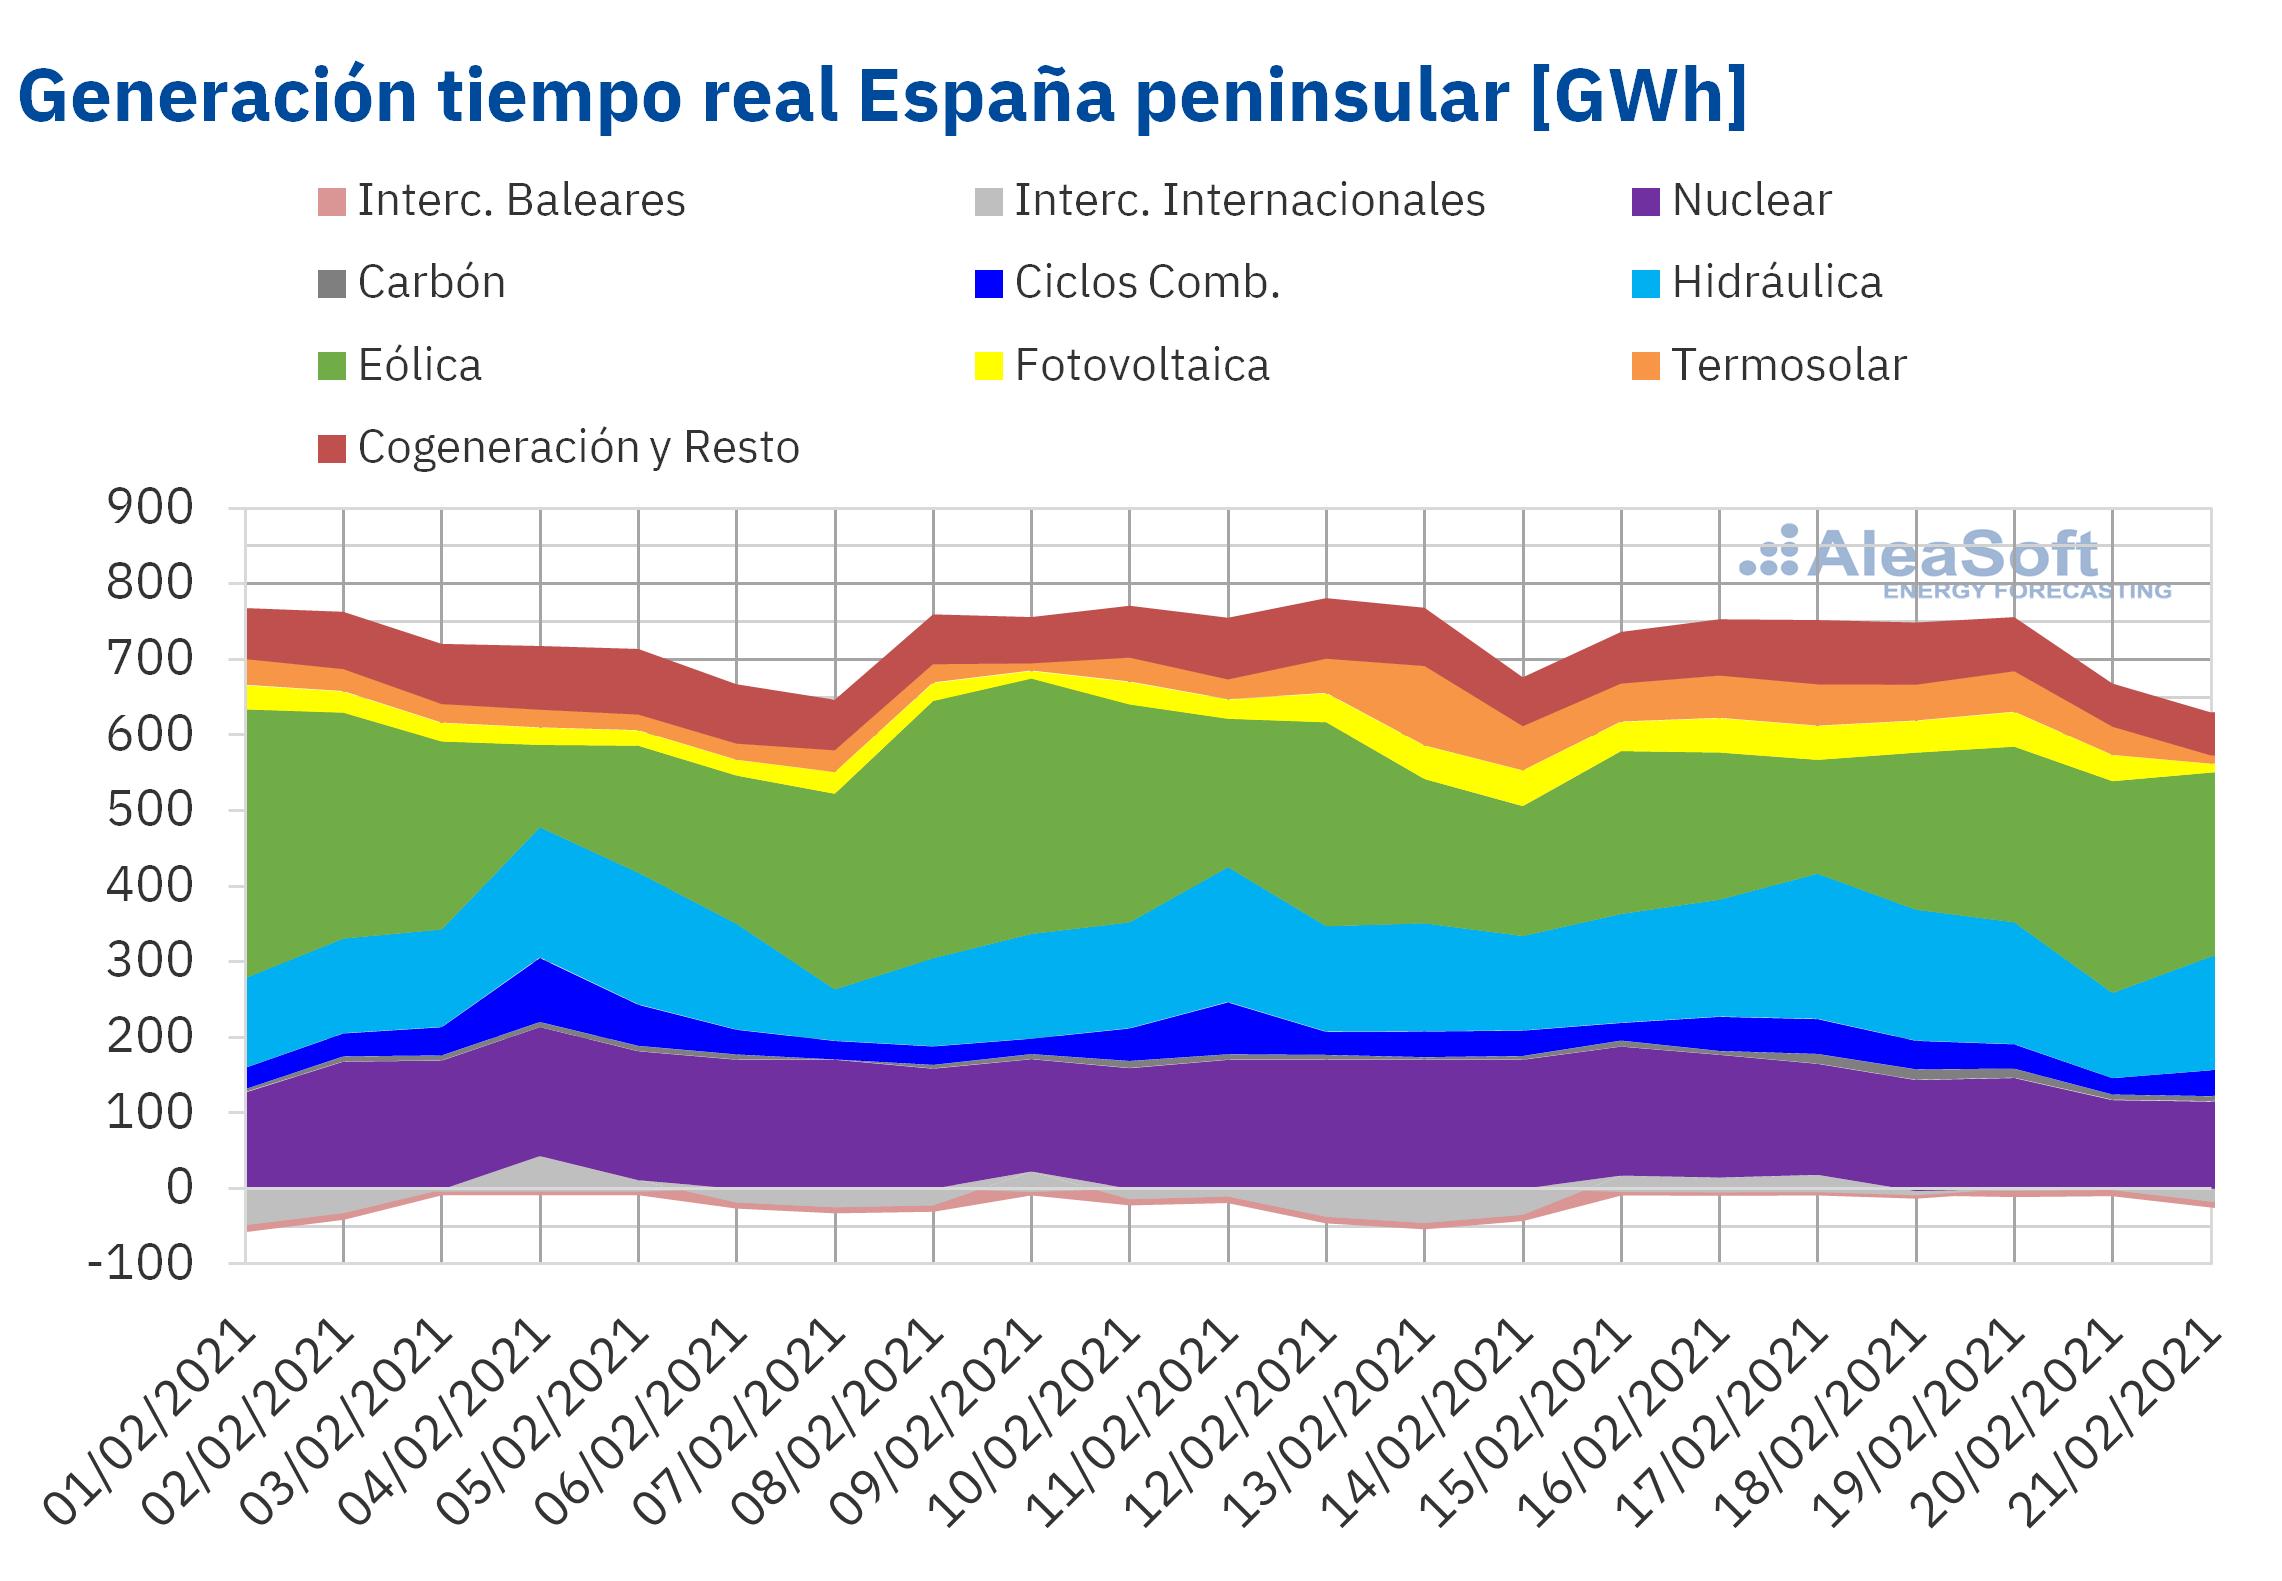 AleaSoft - Generacion tiempo real espana peninsular